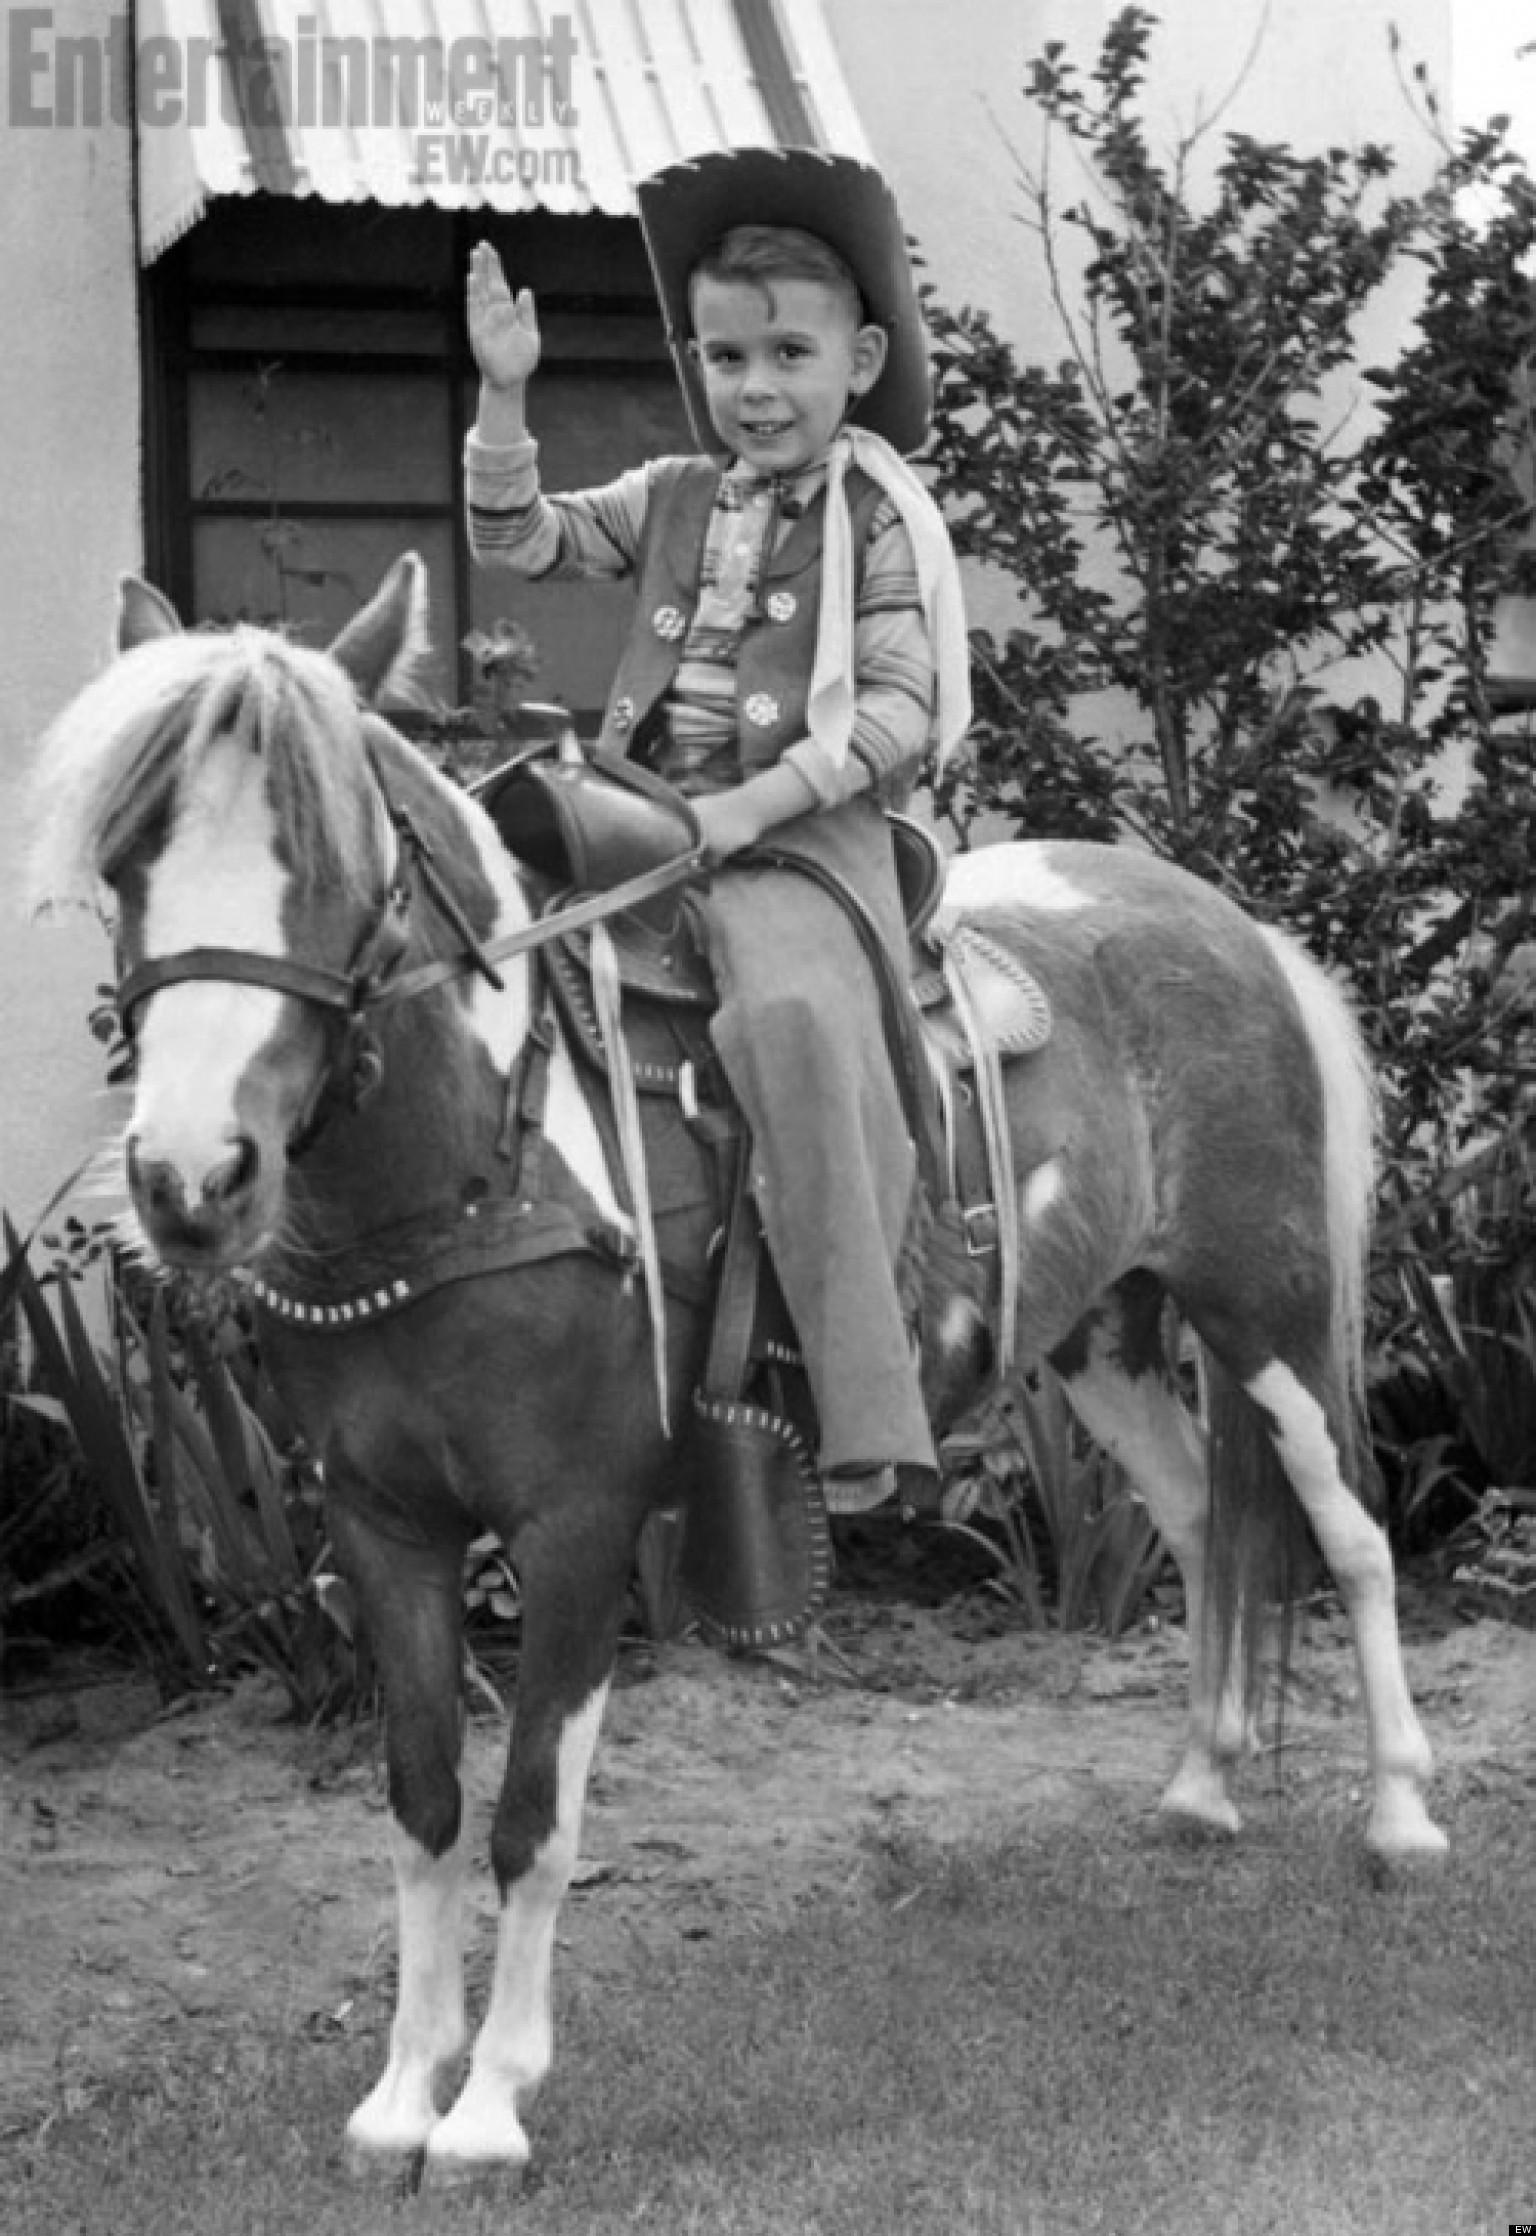 tim burton childhood photo huffpost